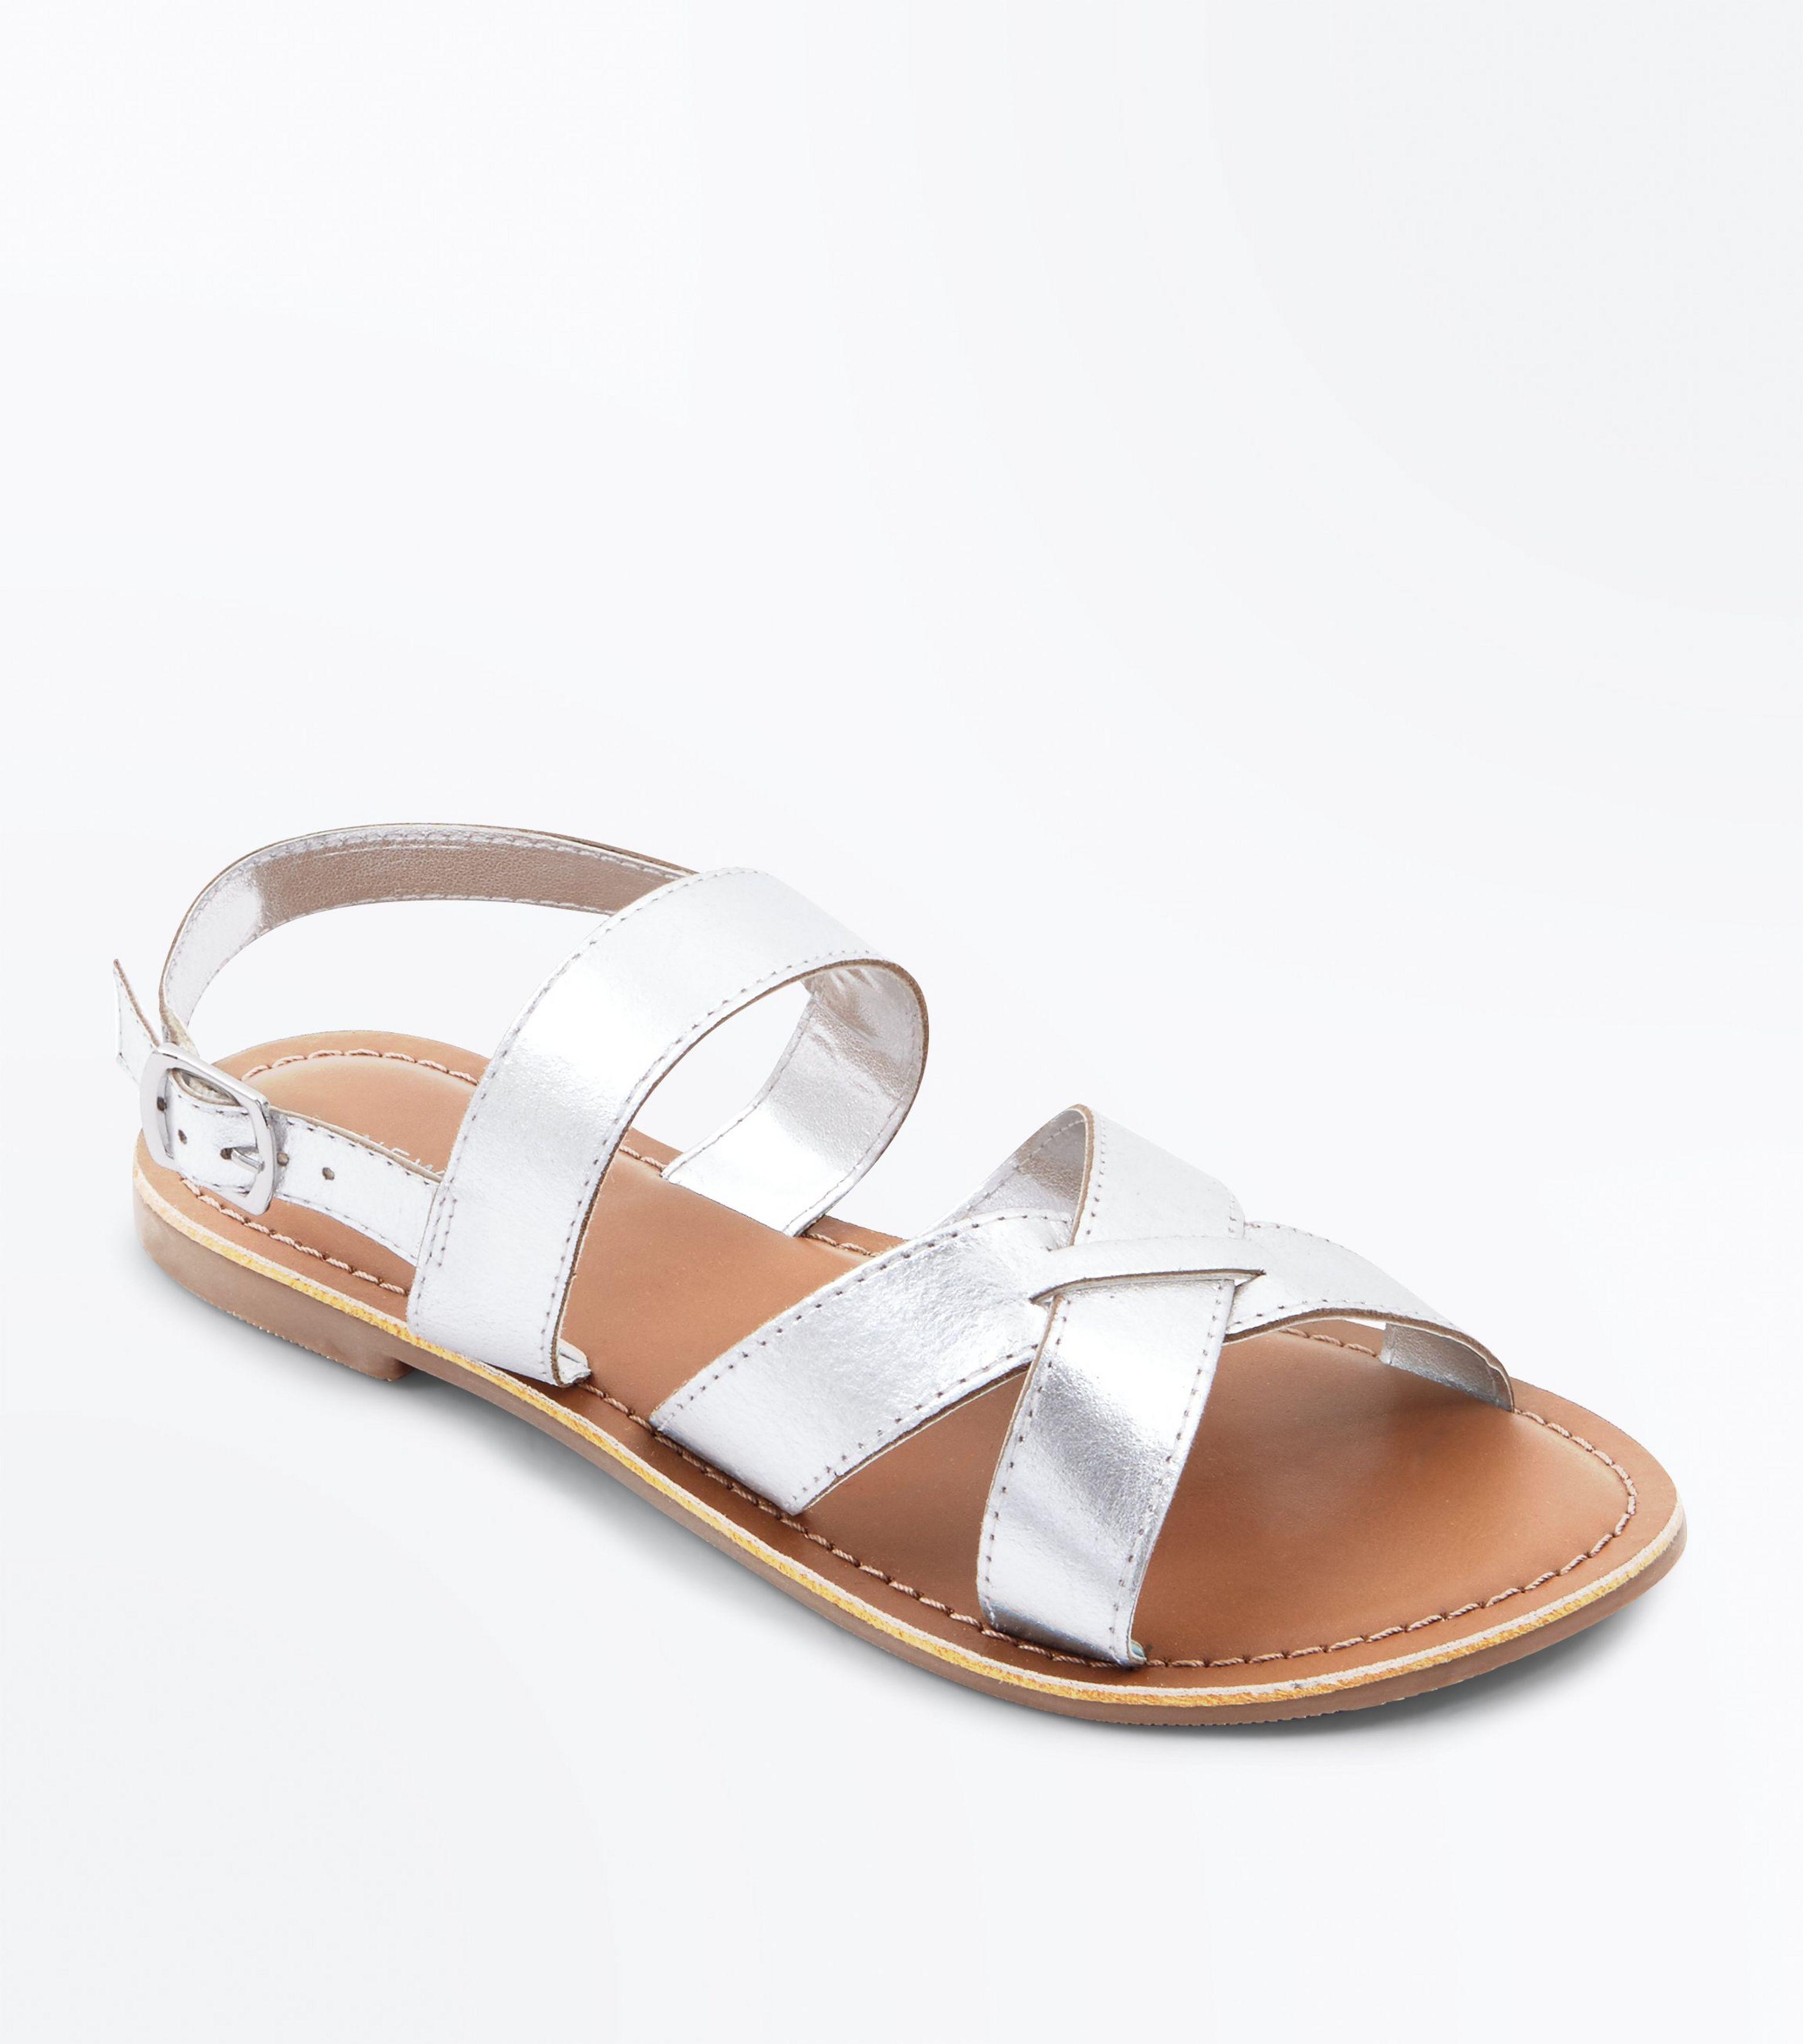 b9874b774 New Look Silver Leather Cross Strap Flat Sandals in Metallic - Lyst